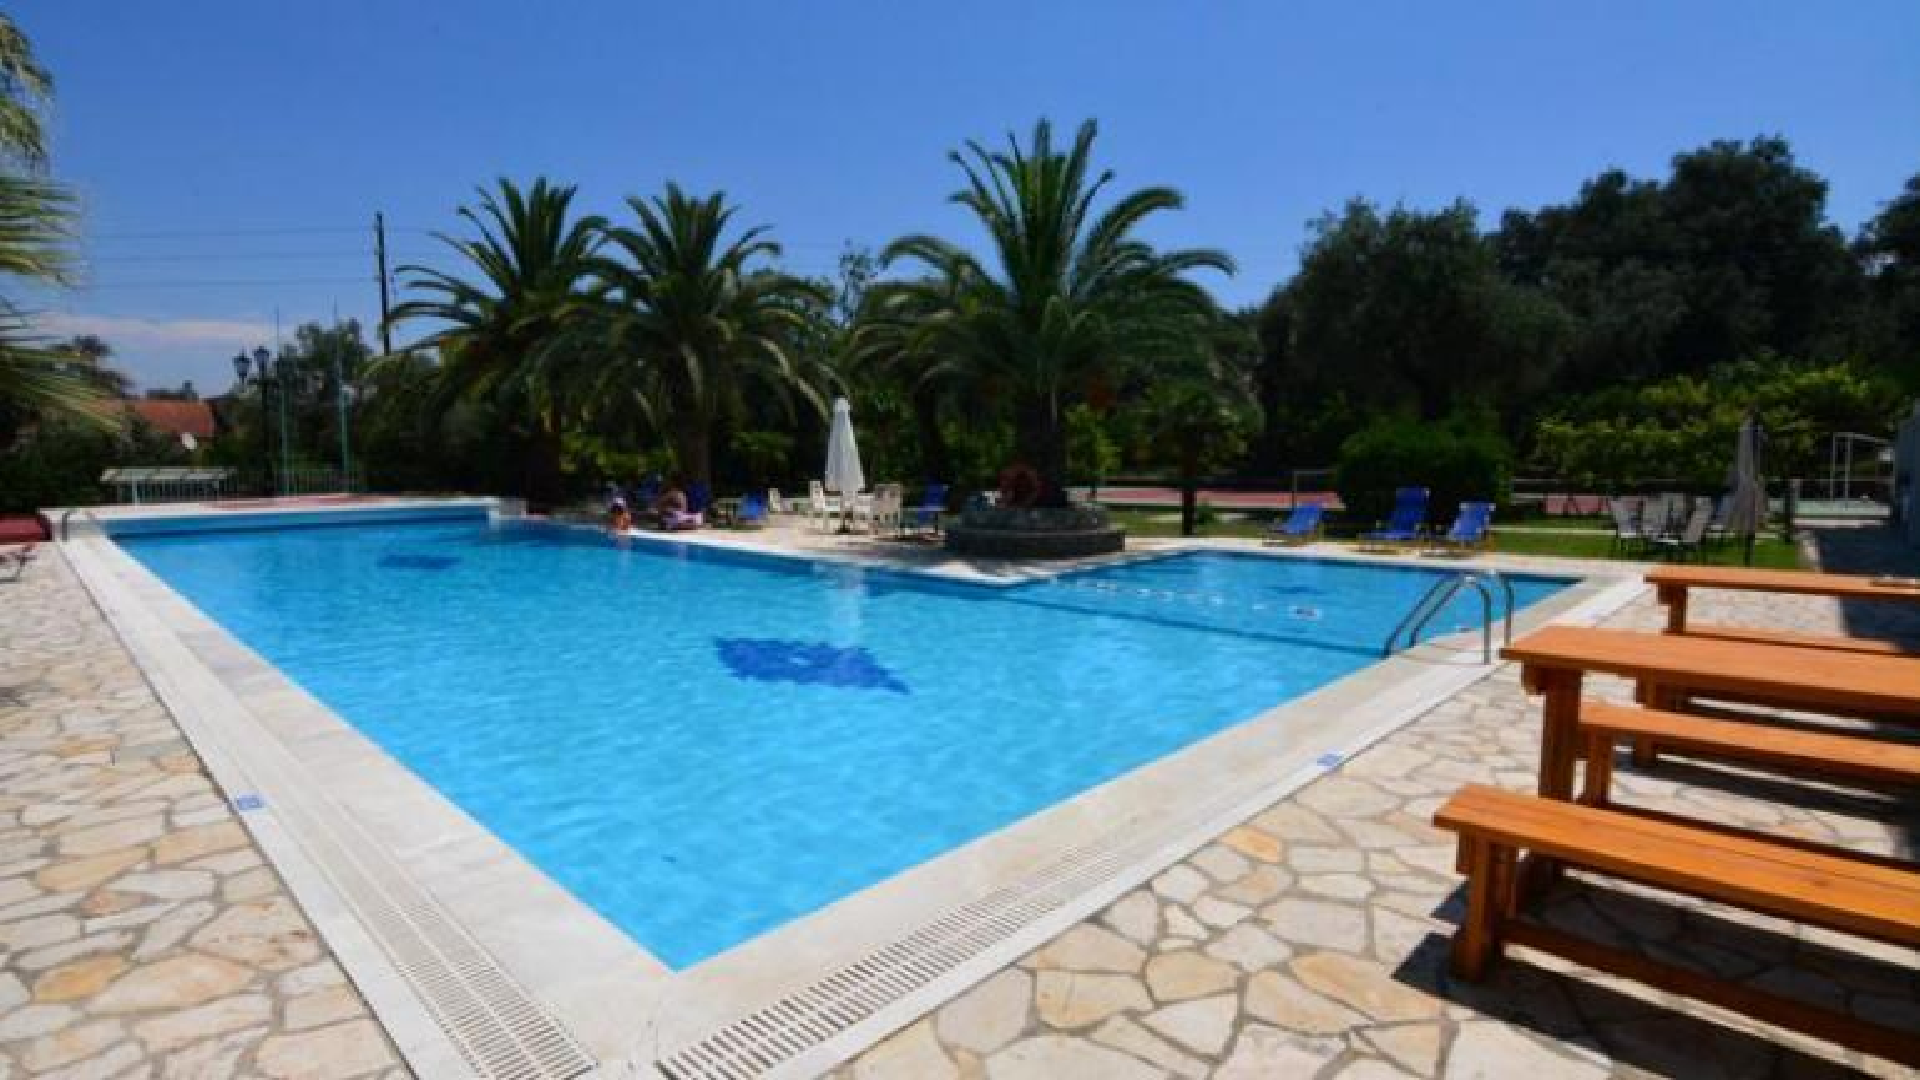 Paloma Blanca Hotel - Κέρκυρα ✦ -30% ✦ 4 Ημέρες (3